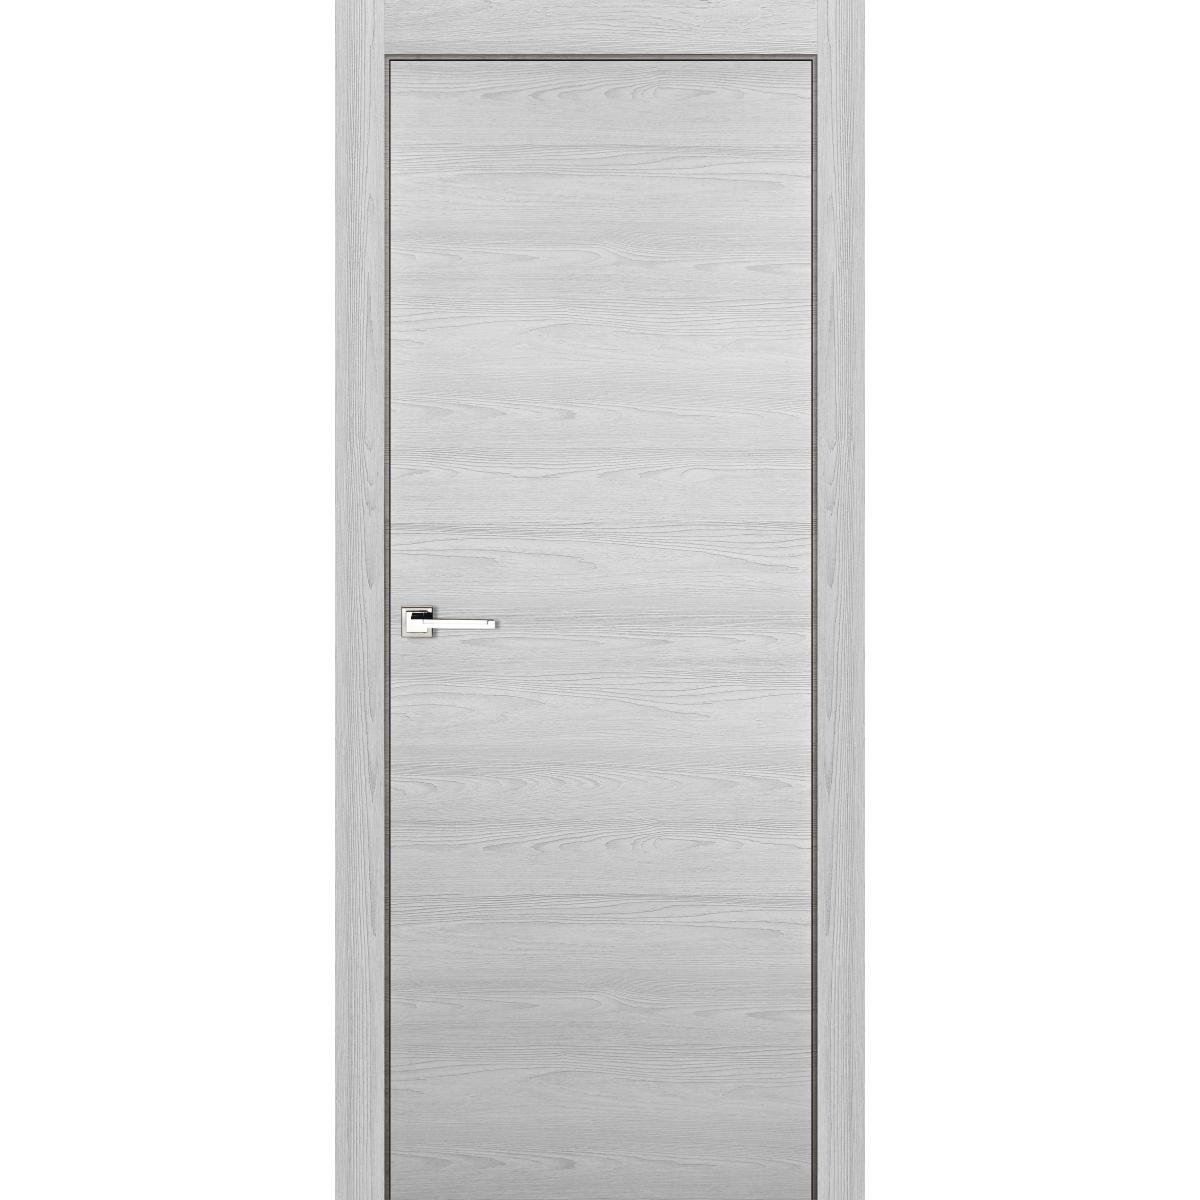 Дверь межкомнатная глухая 90x200 см ламинация цвет ясень серый